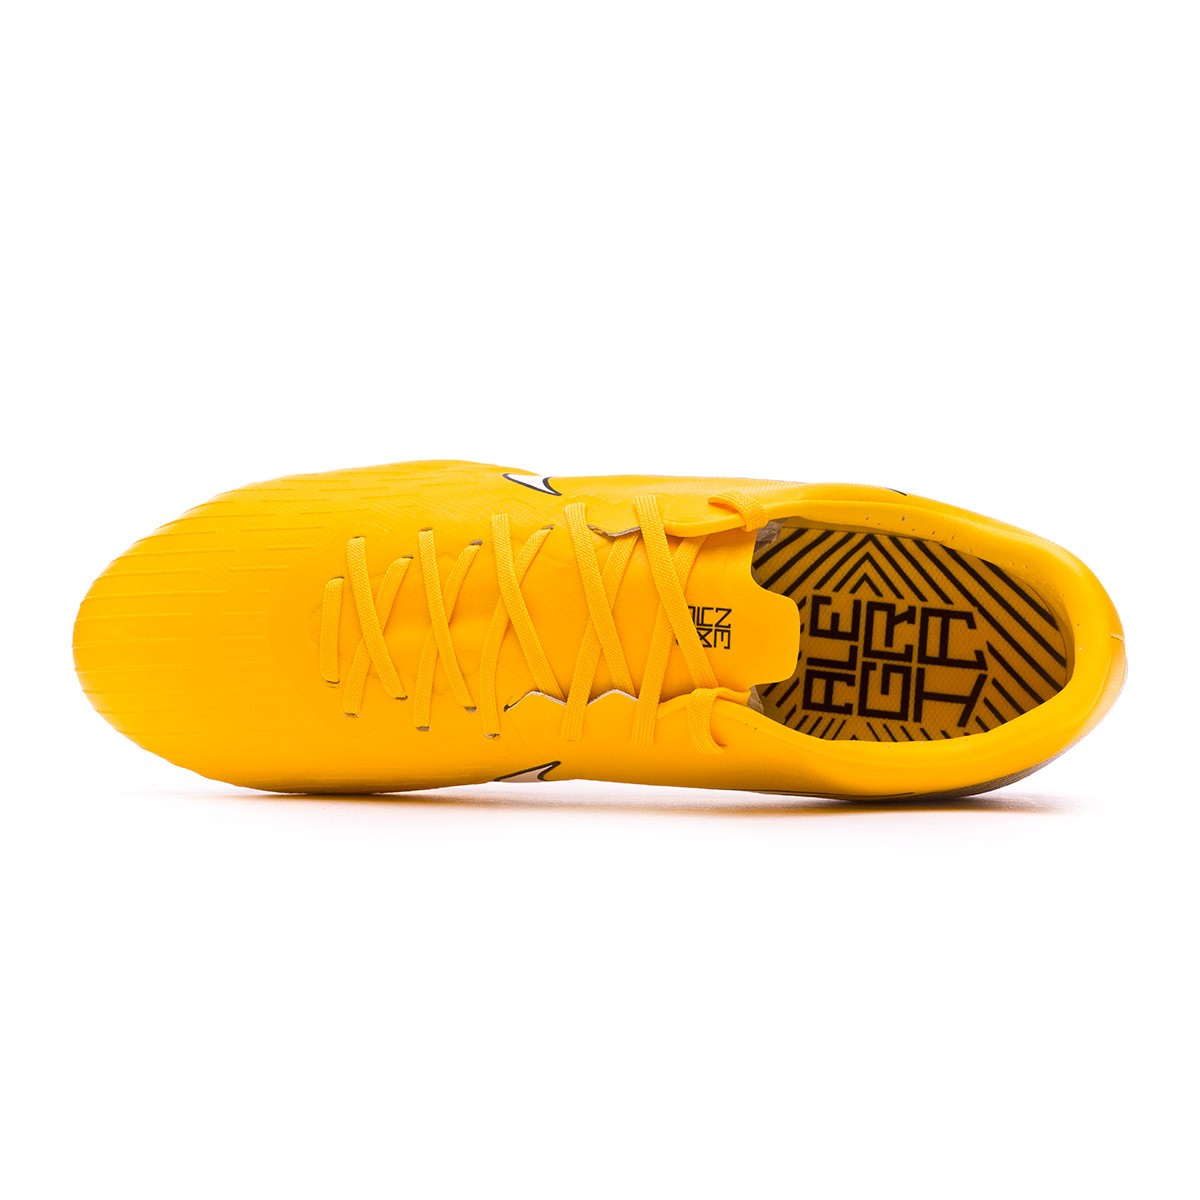 b6c4a8a8f Football Boots Nike Mercurial Vapor XII Pro FG Neymar Yellow-Black - Tienda  de fútbol Fútbol Emotion